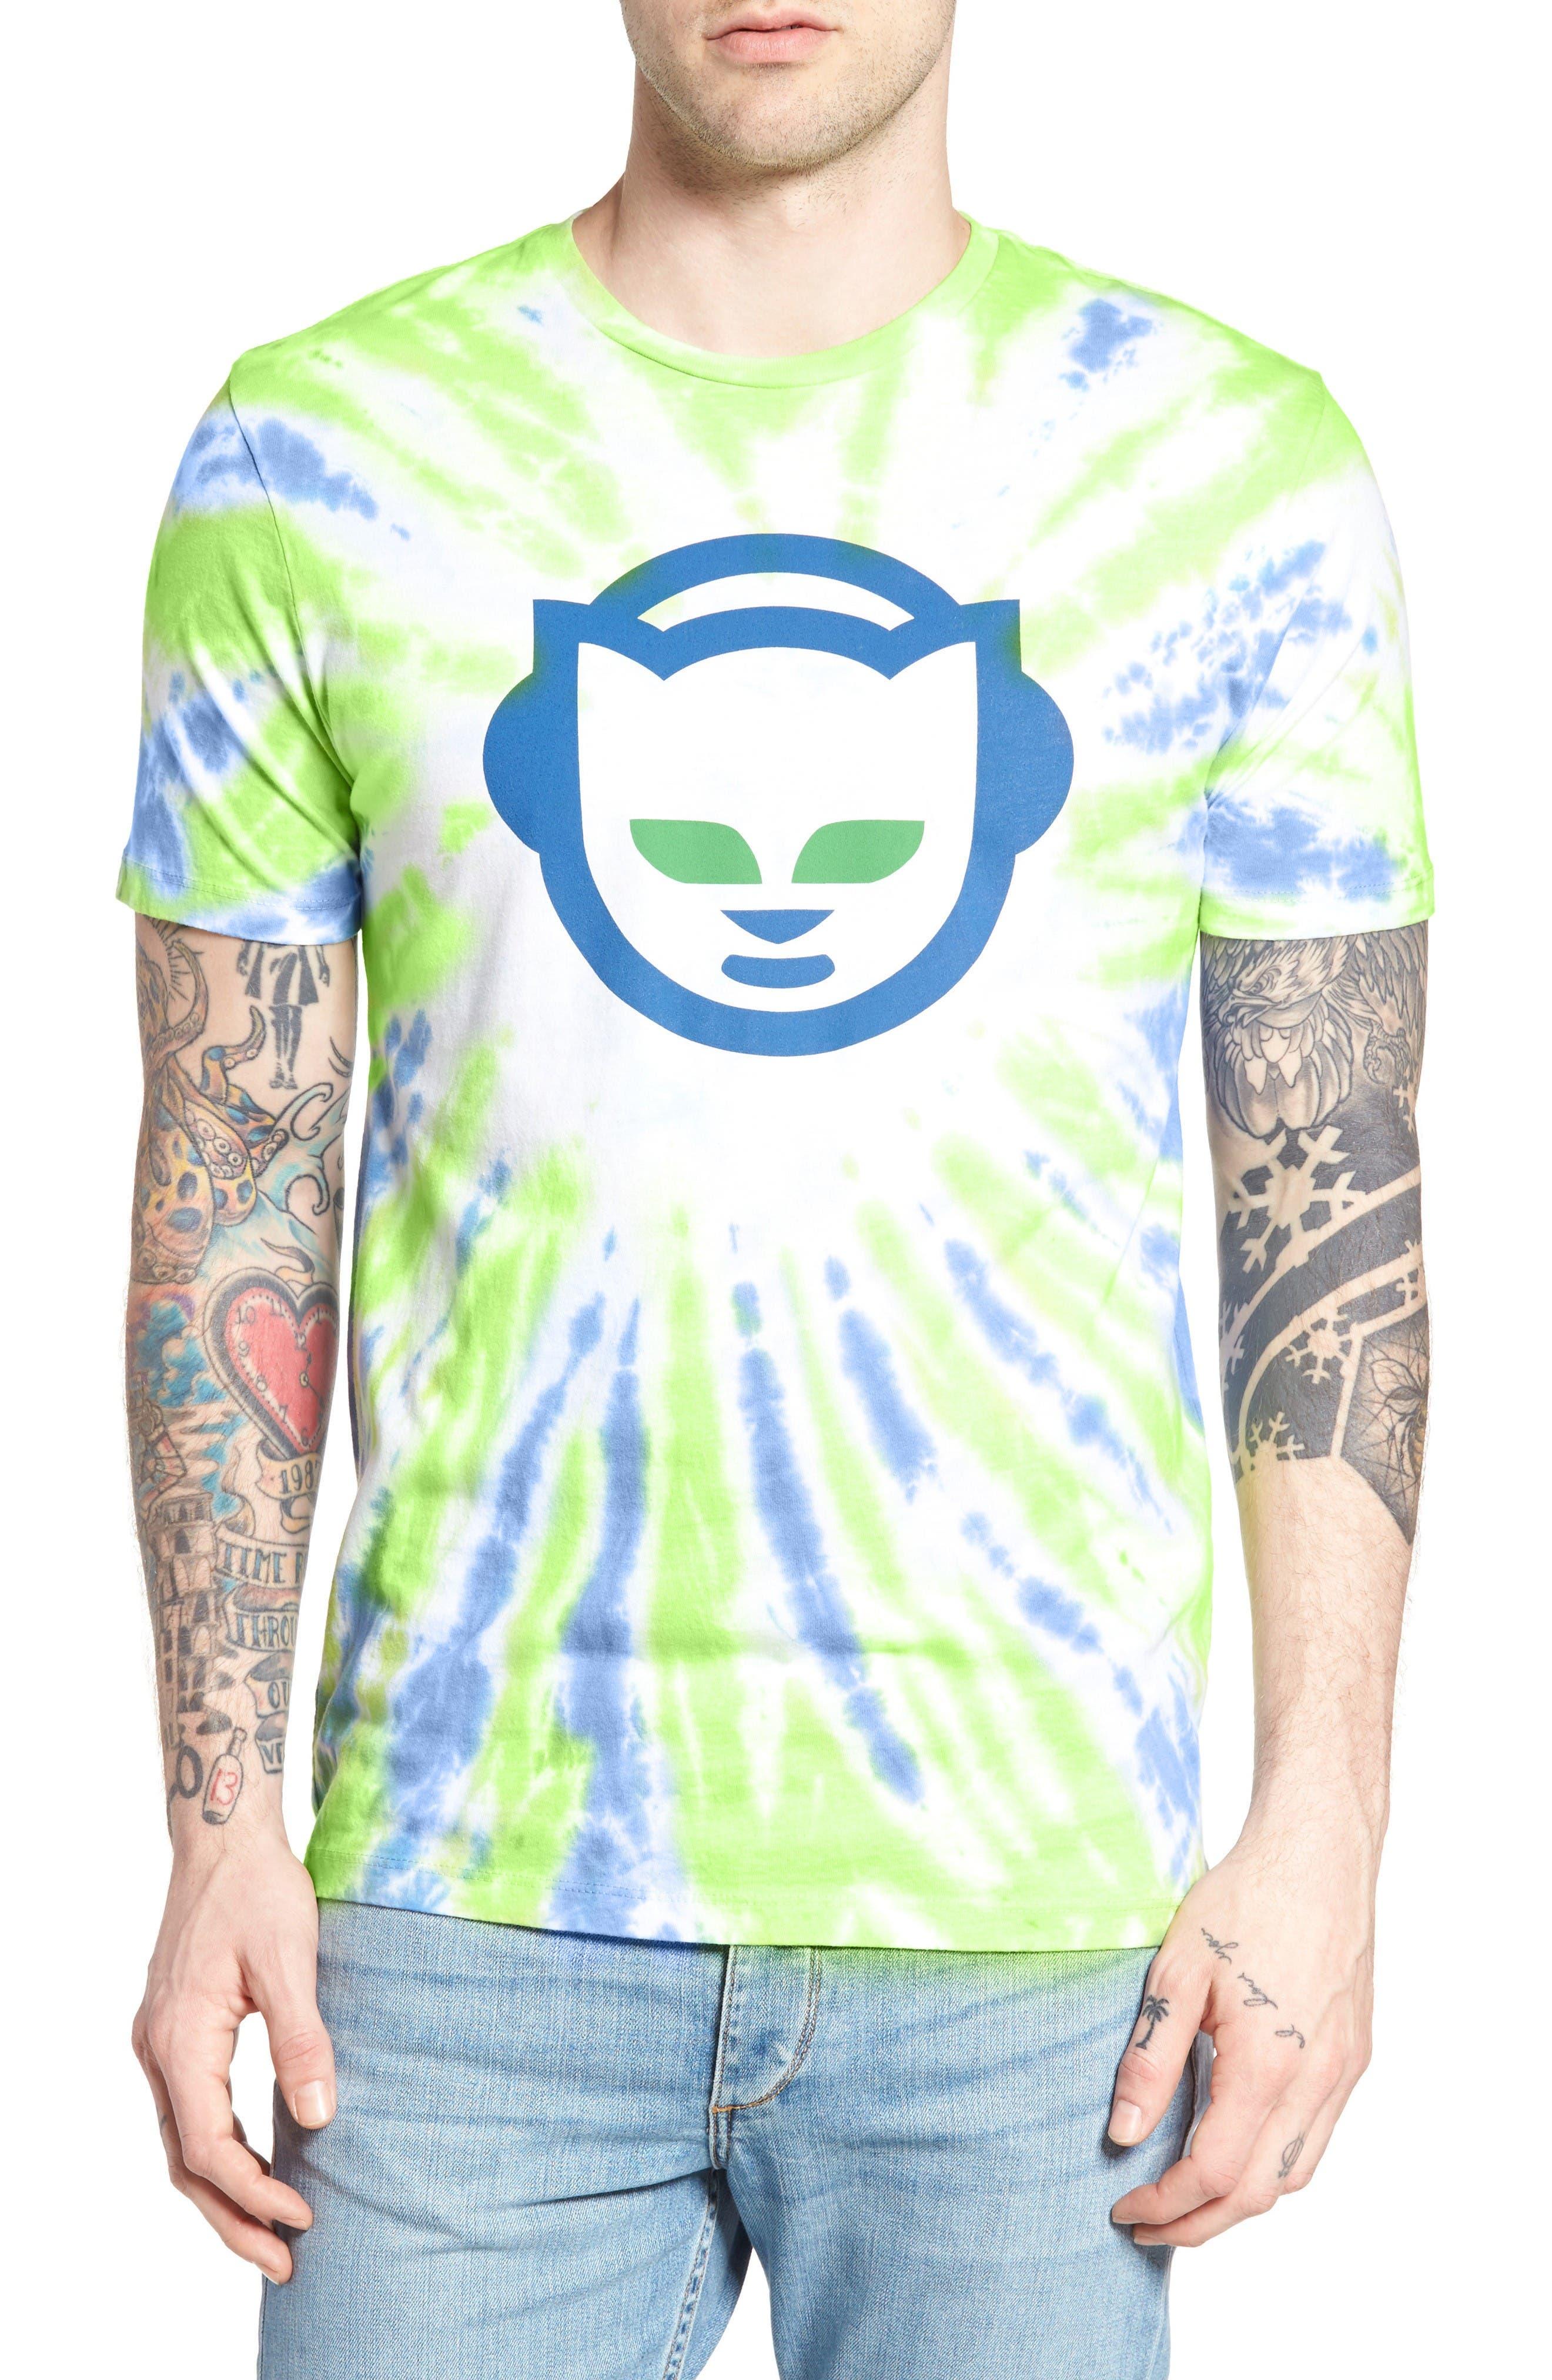 Altru Tie Dye Napster Graphic T-Shirt